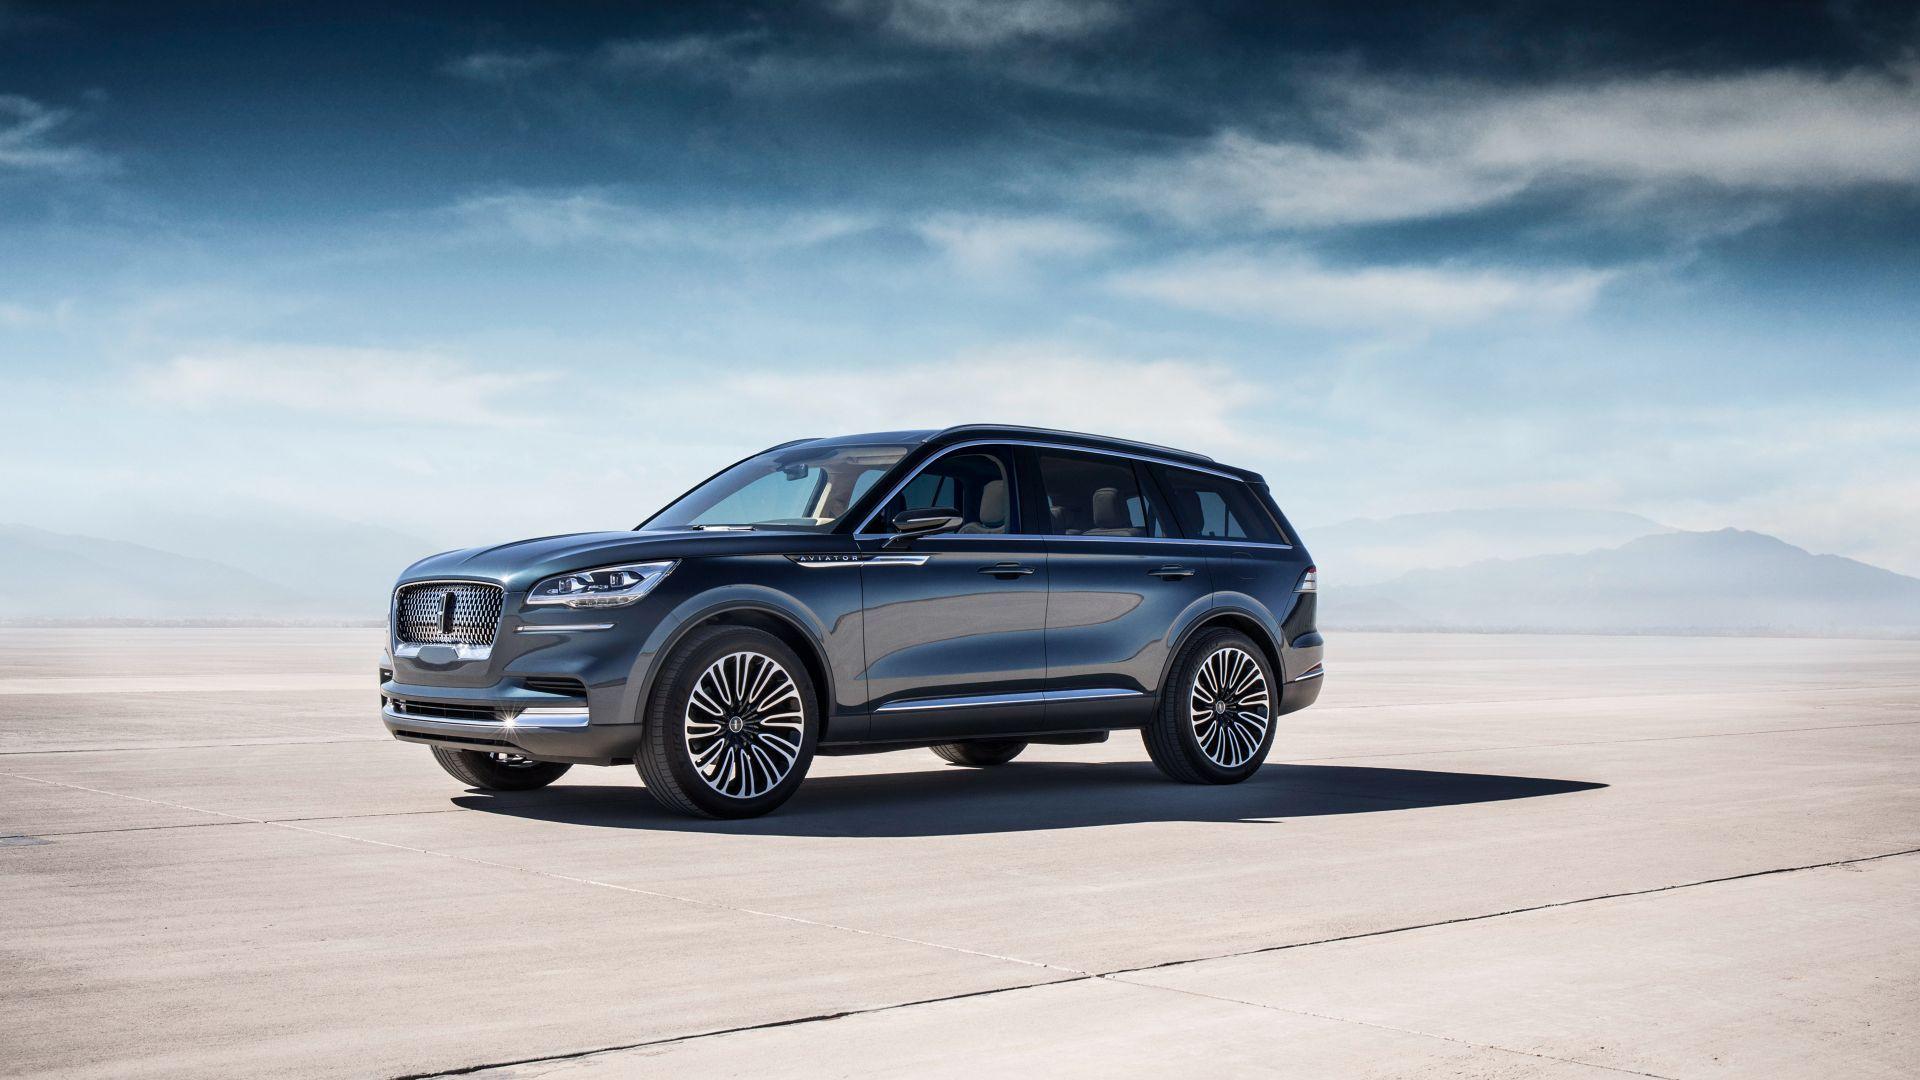 Lincoln Aviator Suv 2019 Cars Electric Car 4k Horizontal Car